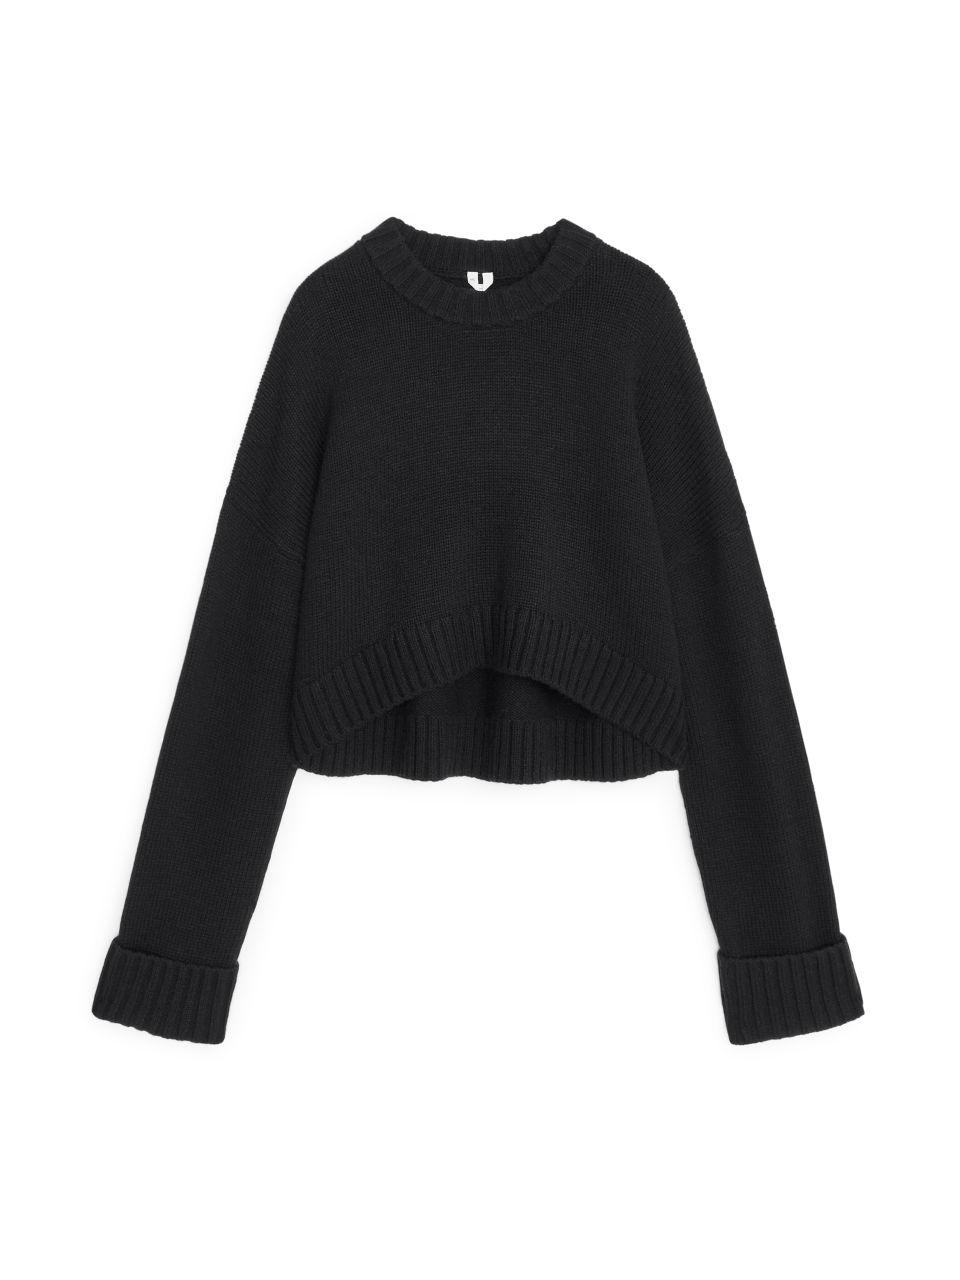 Wool Nylon Cropped Jumper - Black